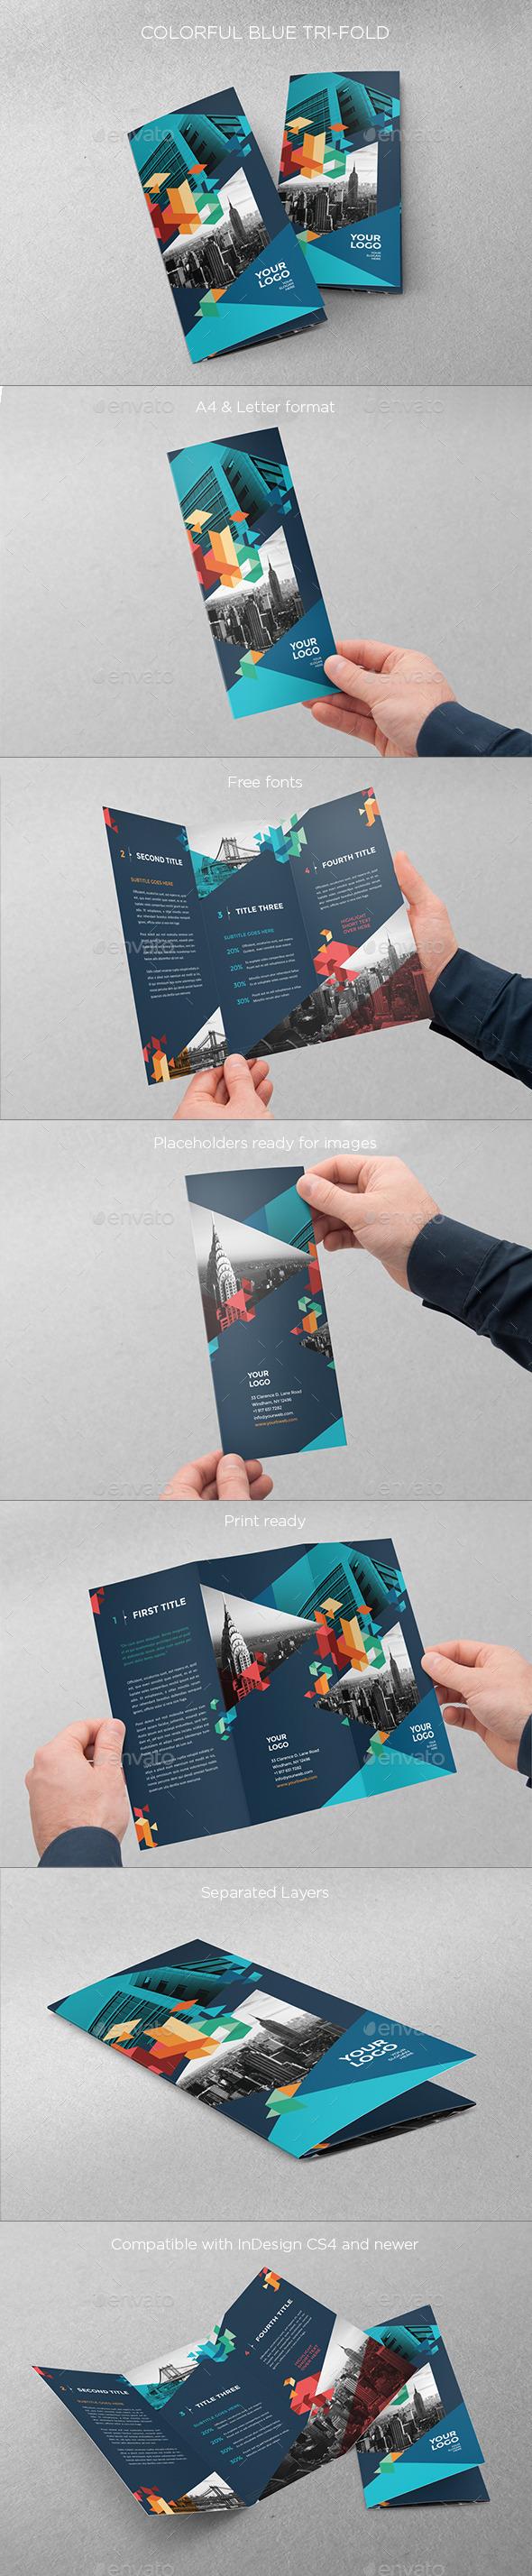 GraphicRiver Colorful Blue Trifold 10814349